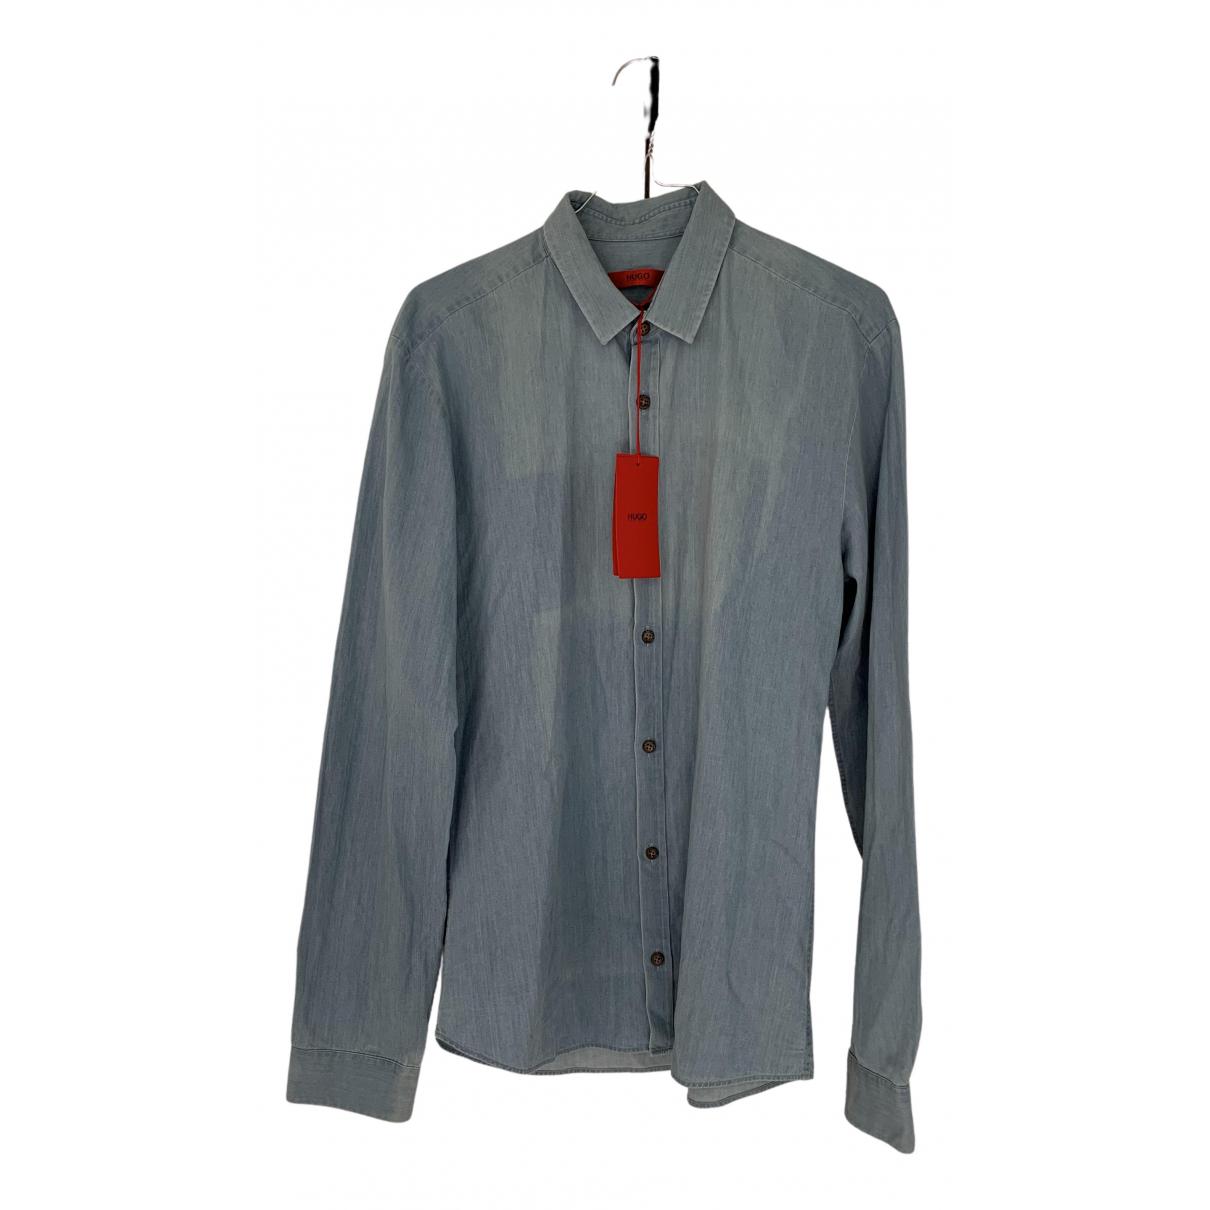 Hugo Boss N Blue Cotton Shirts for Men S International